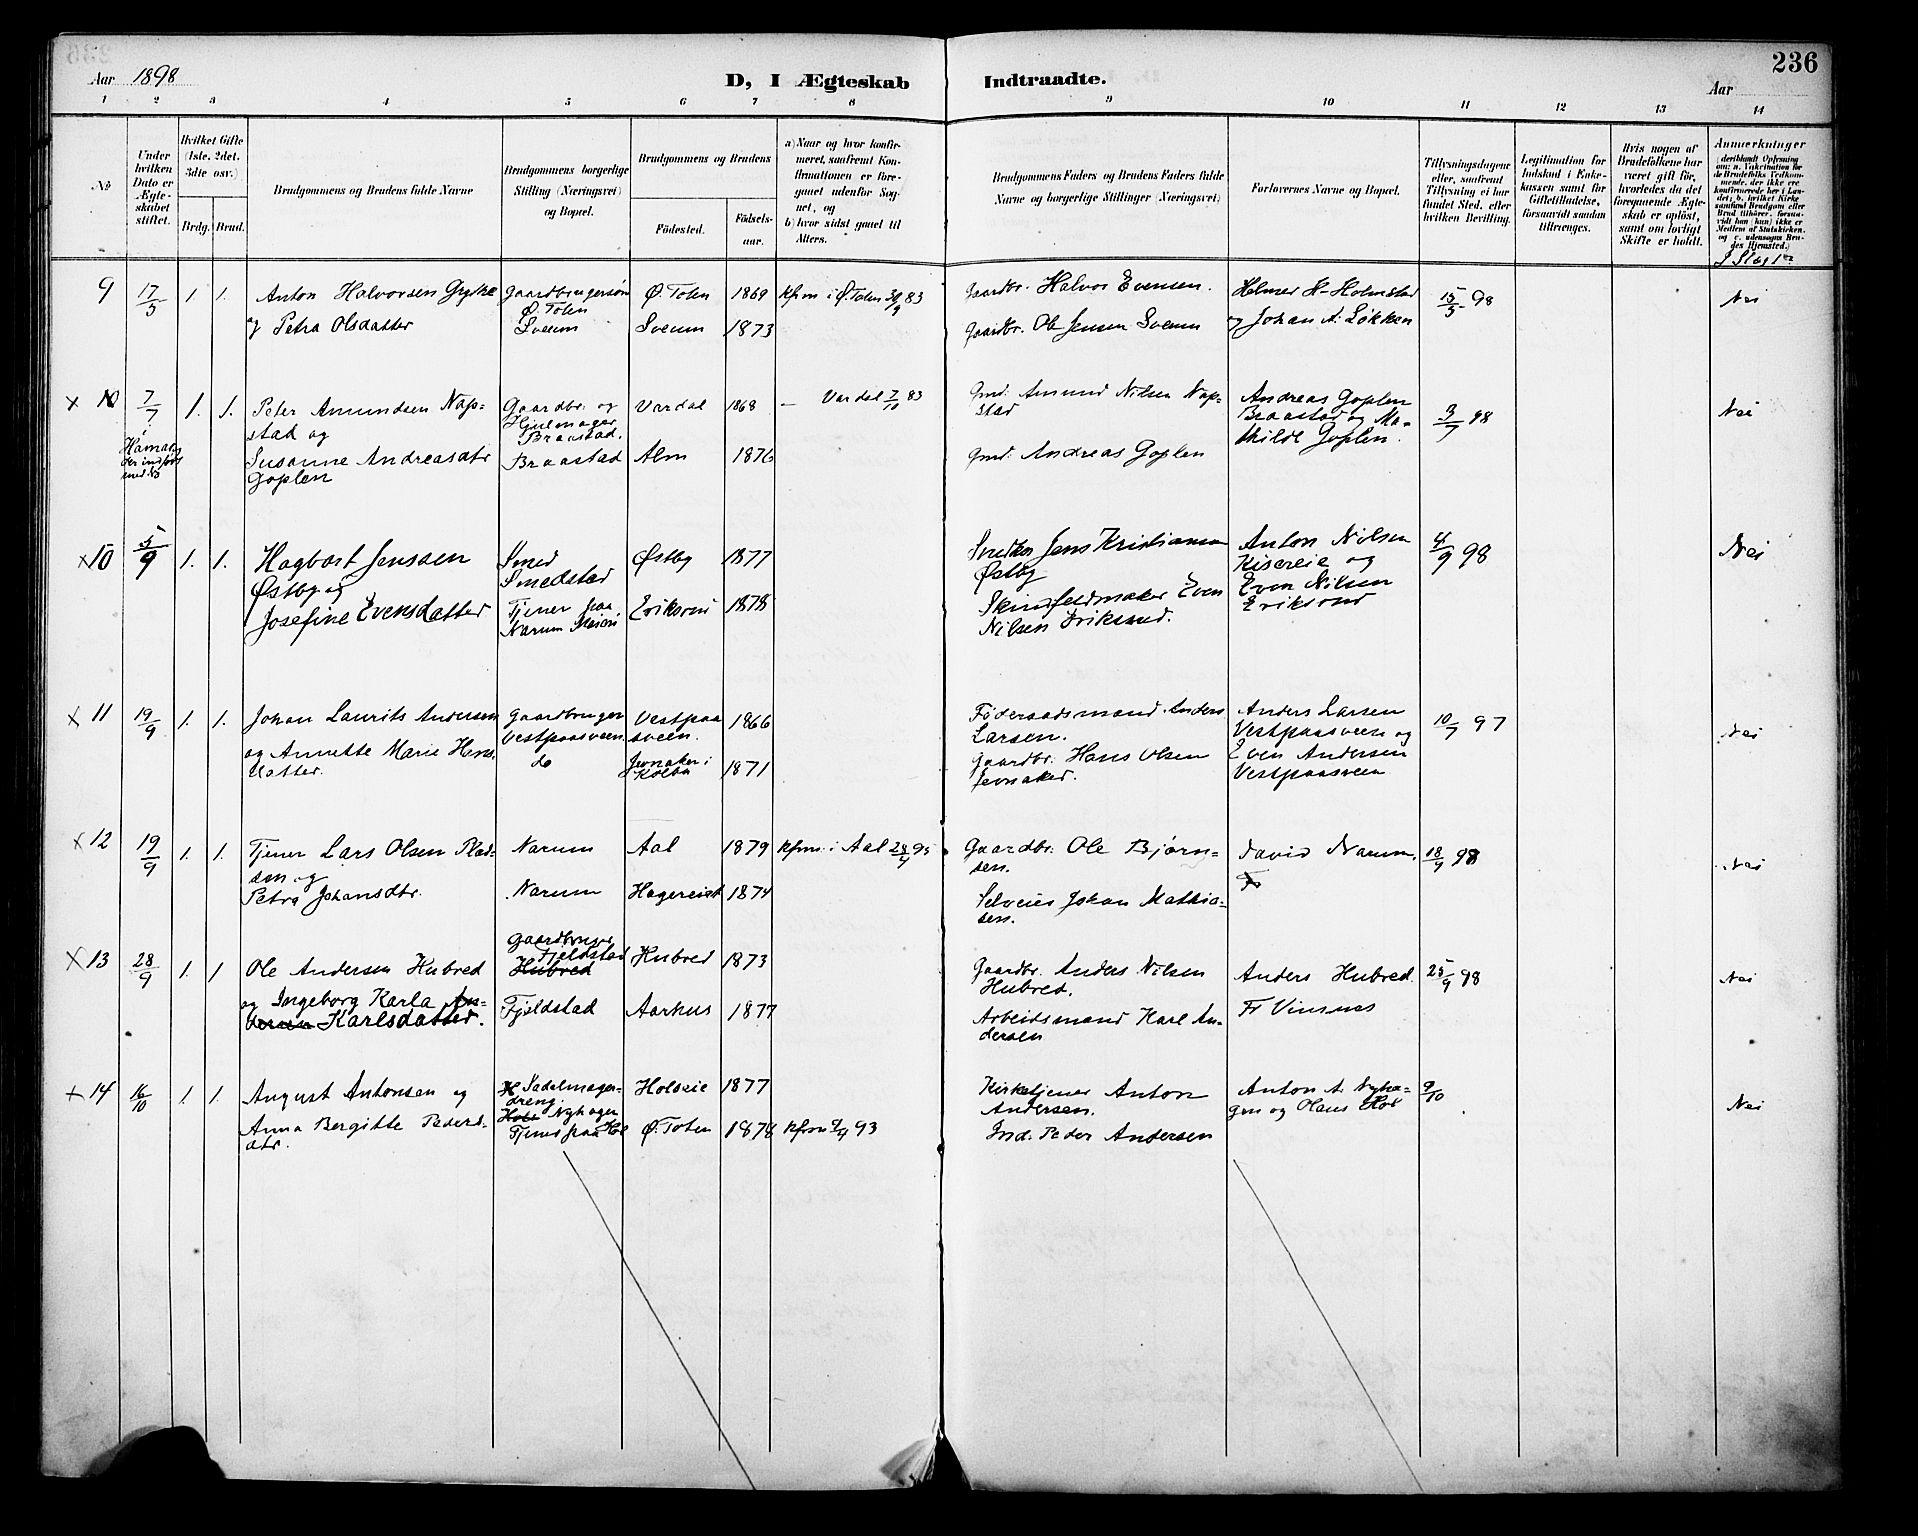 SAH, Vestre Toten prestekontor, H/Ha/Haa/L0013: Ministerialbok nr. 13, 1895-1911, s. 236